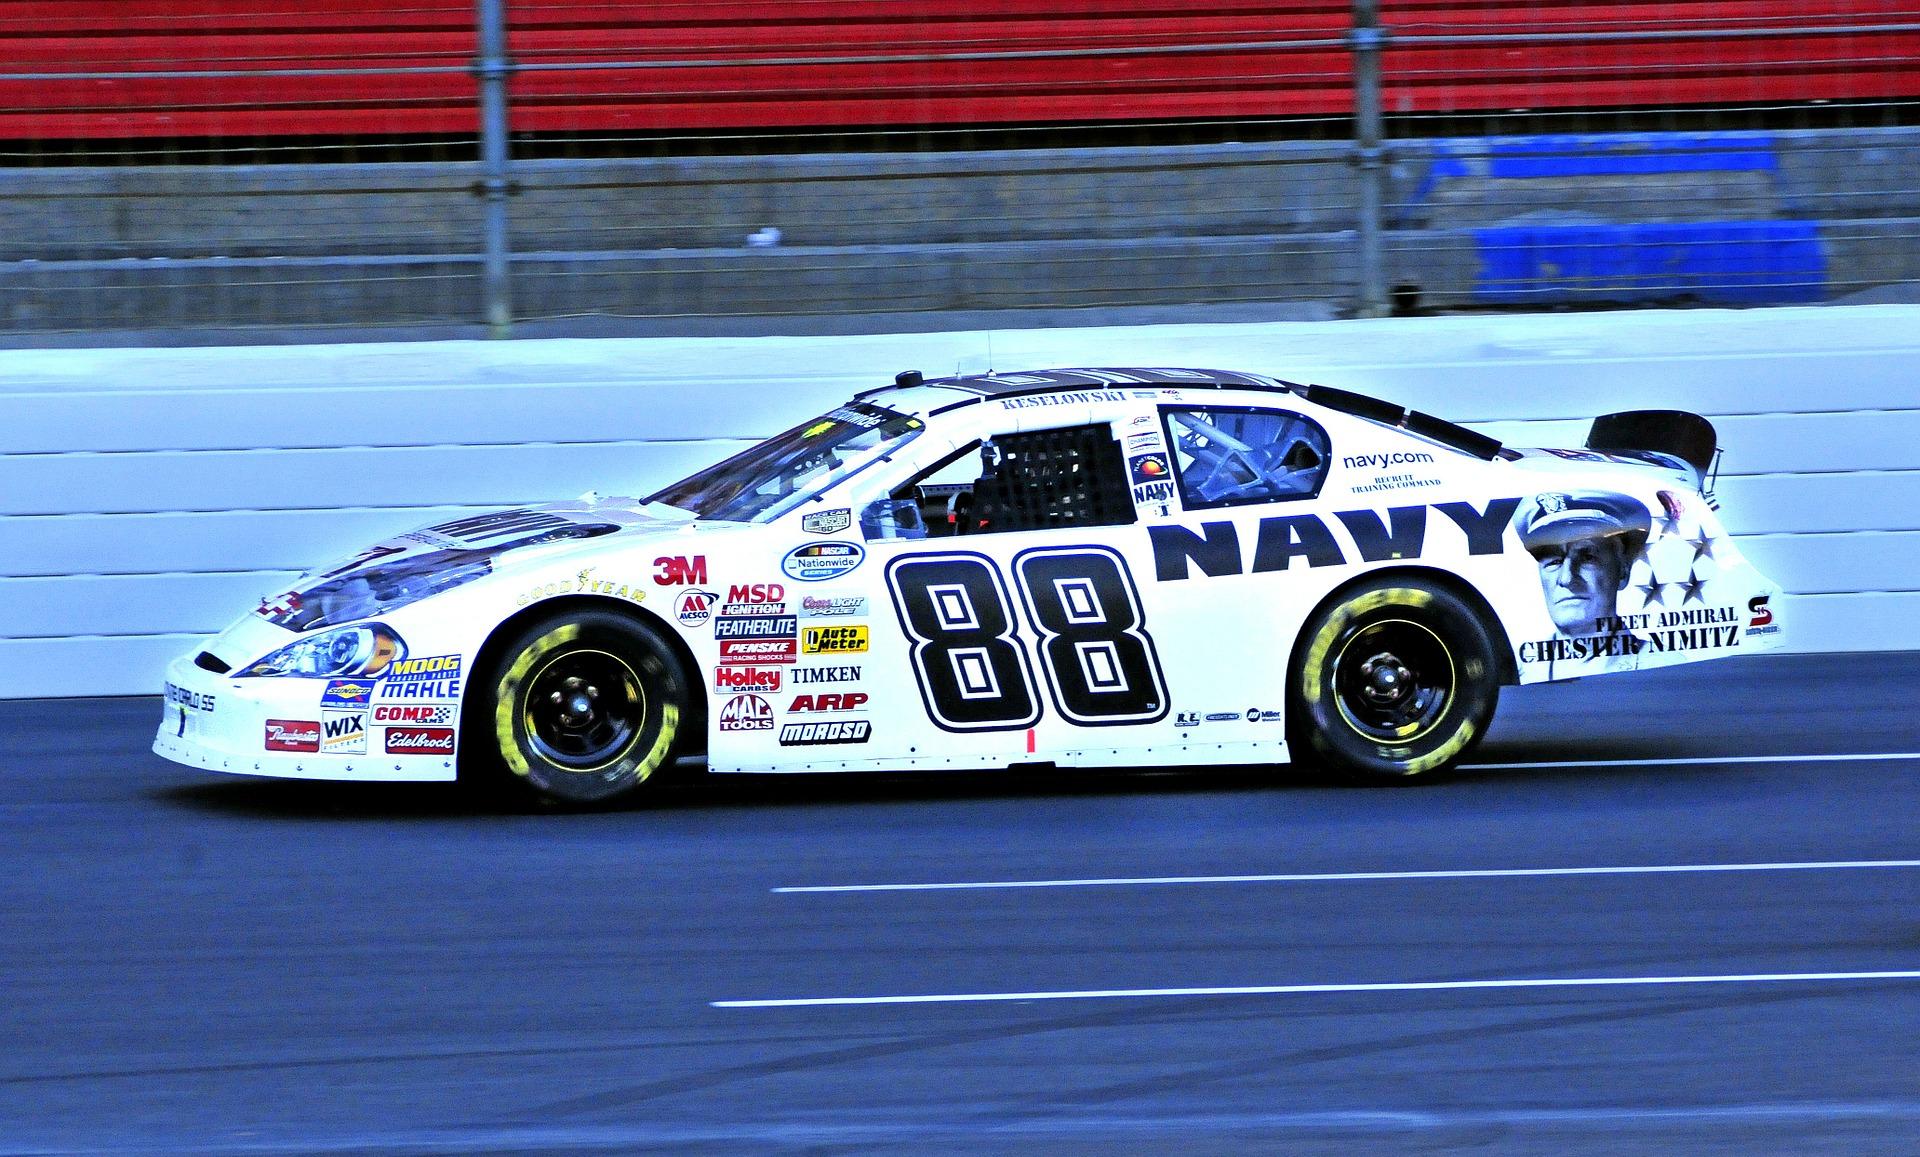 NASCAR Racing, Activity, Championship, Nascar, Race, HQ Photo